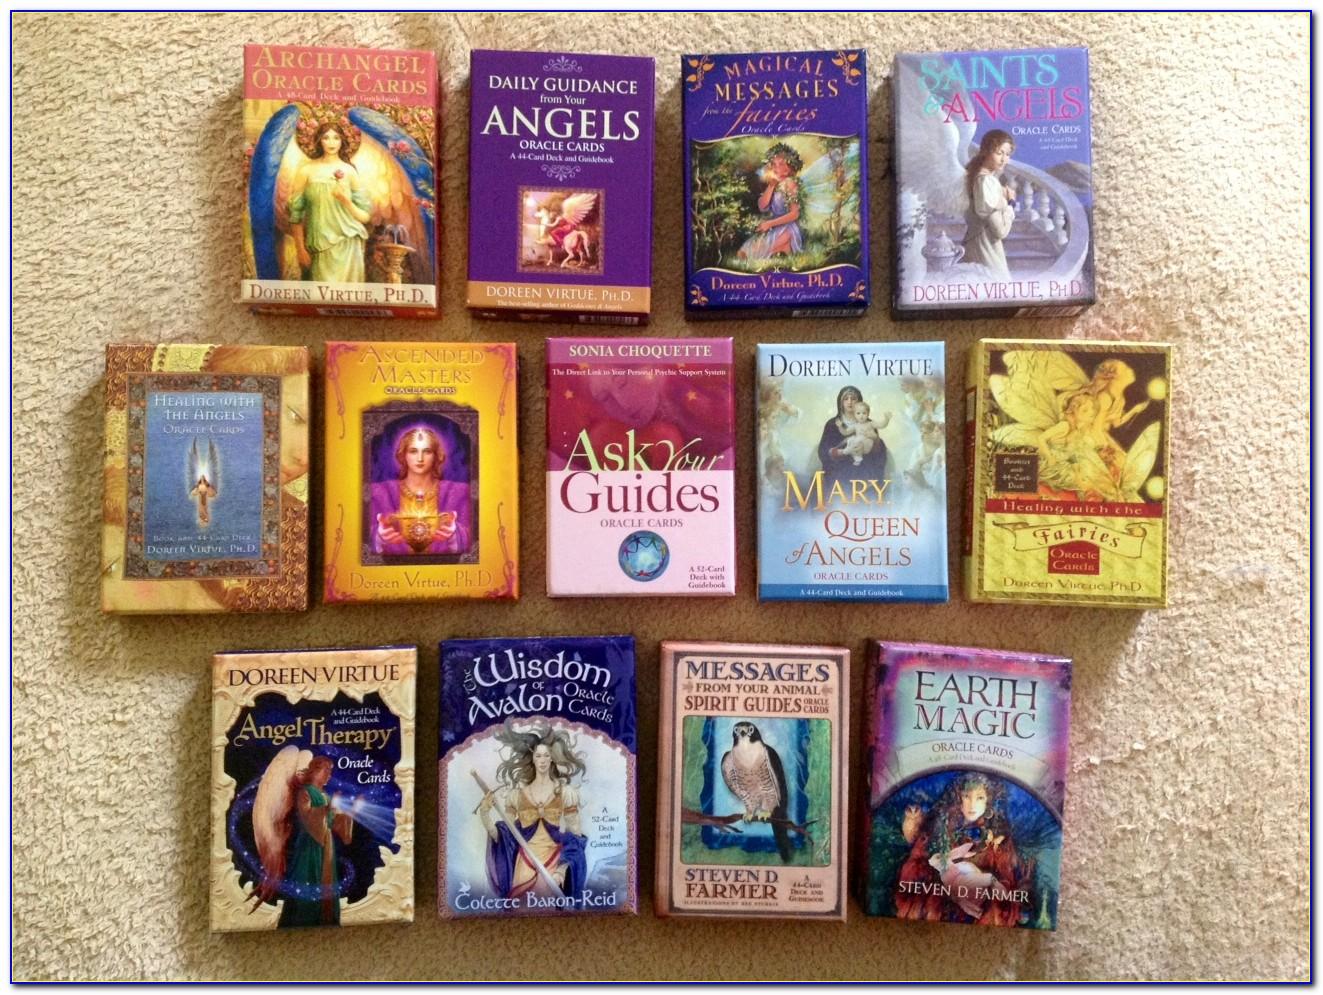 Free Latin Tarot Card Reading Online